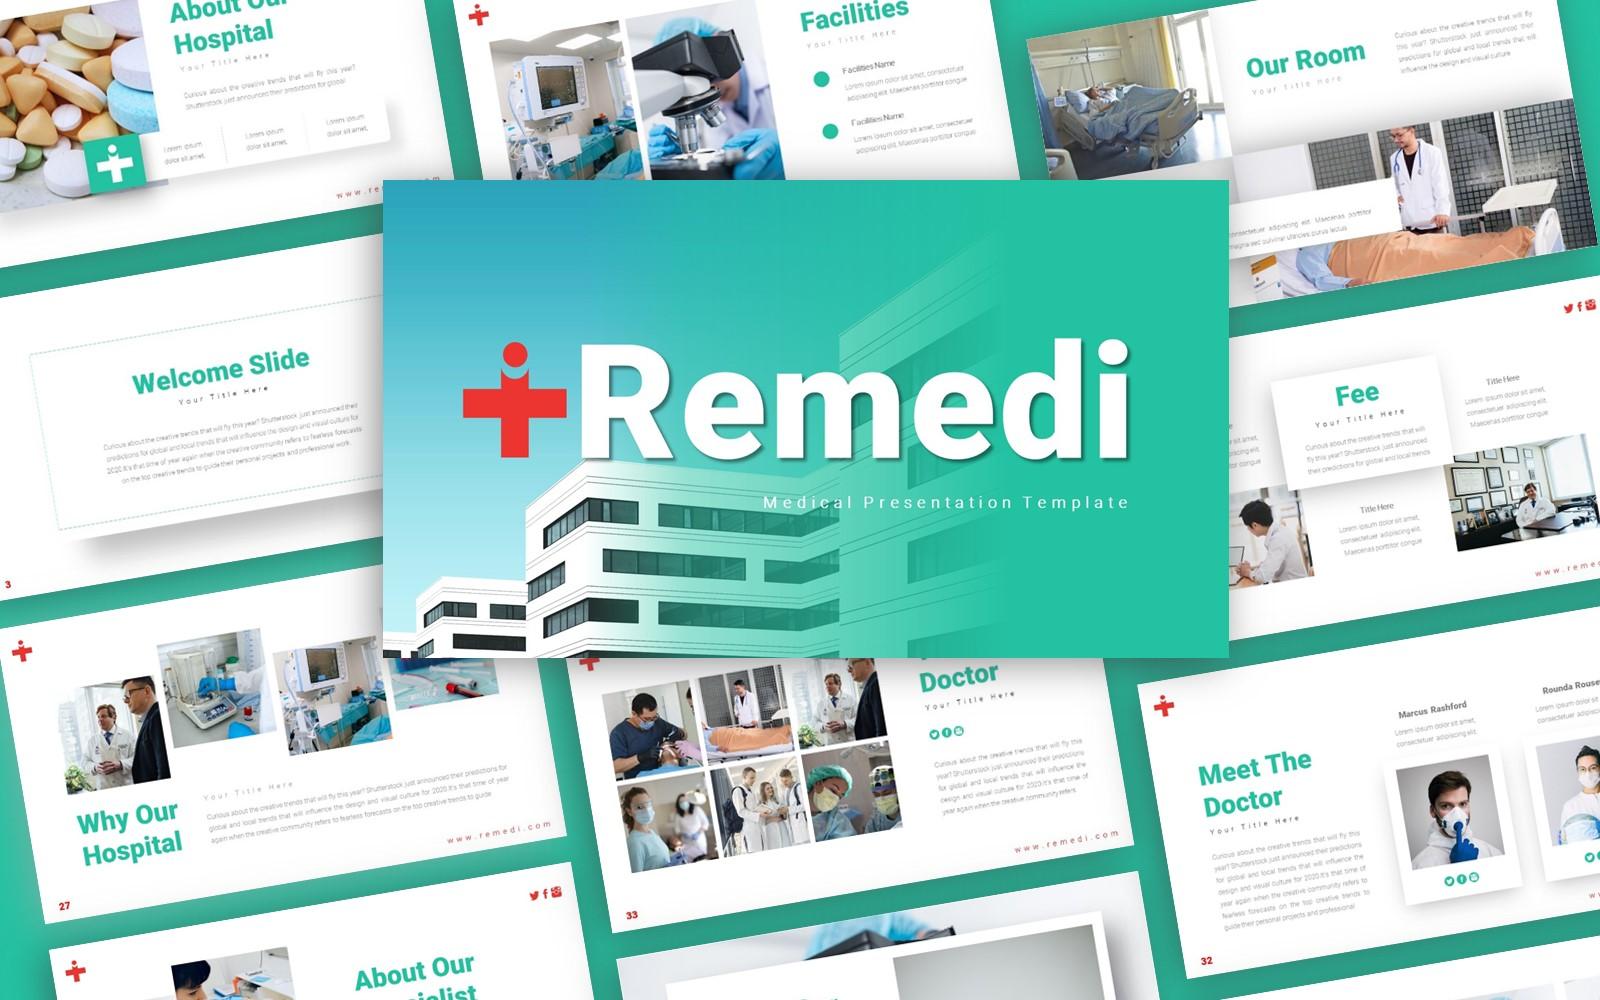 Remedi Medical Presentation PowerPoint template